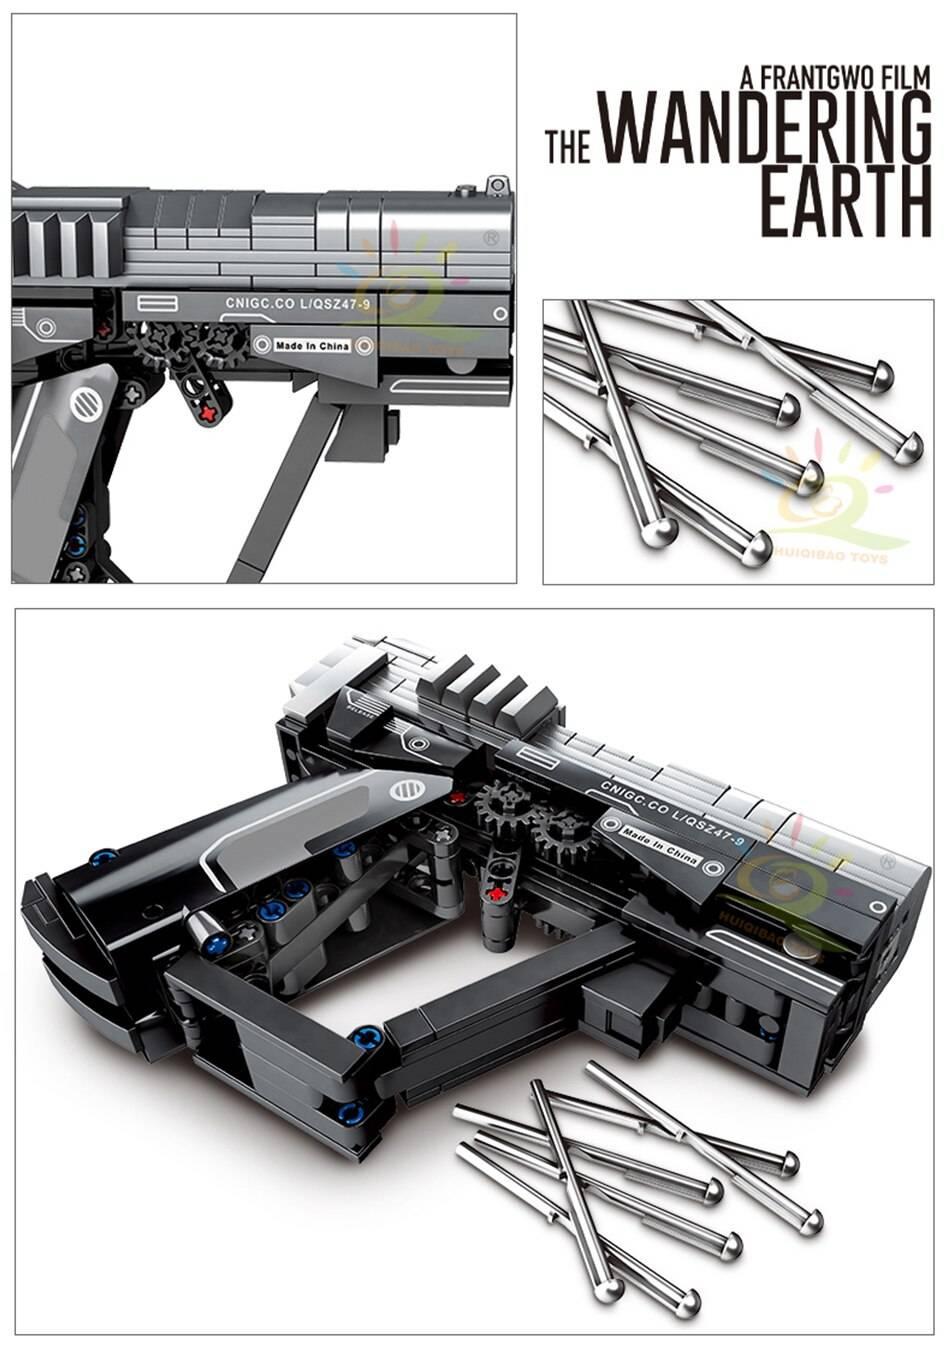 Wandering Earth Signal Gun Building Blocks Toy